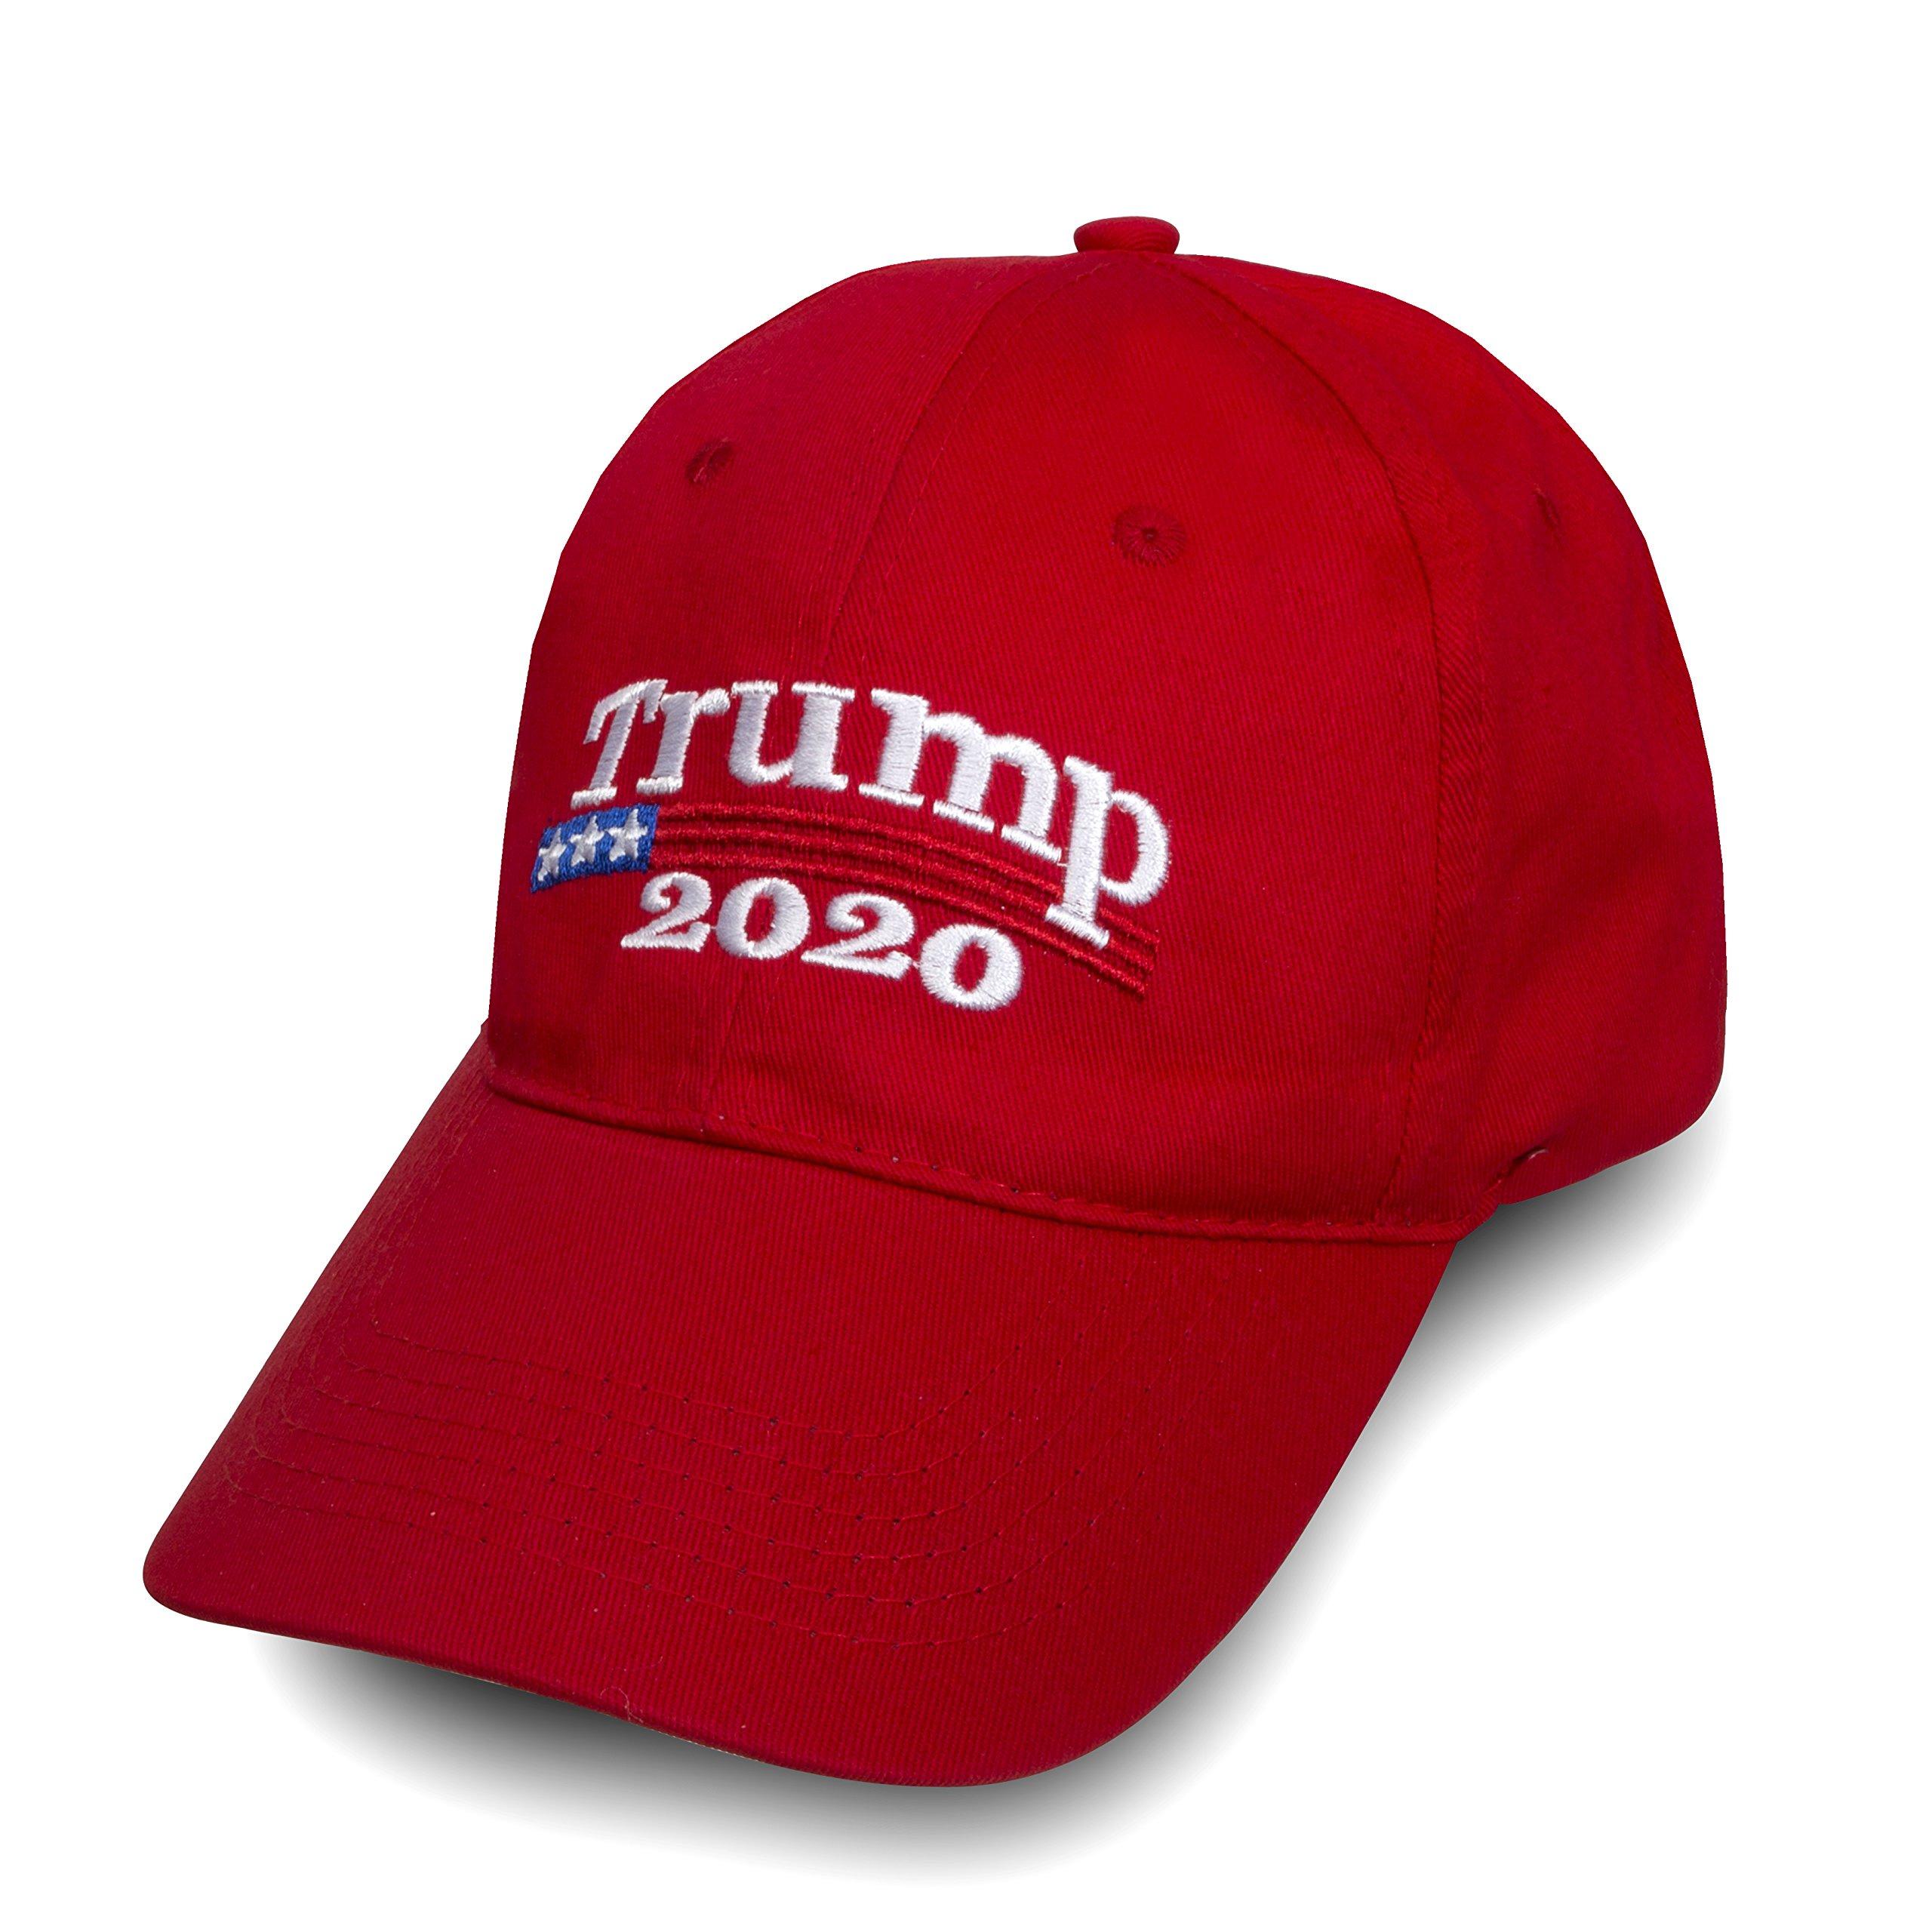 Make America Great Again Donald Trump USA Cap Adjustable Baseball Hat (Trump 2020)